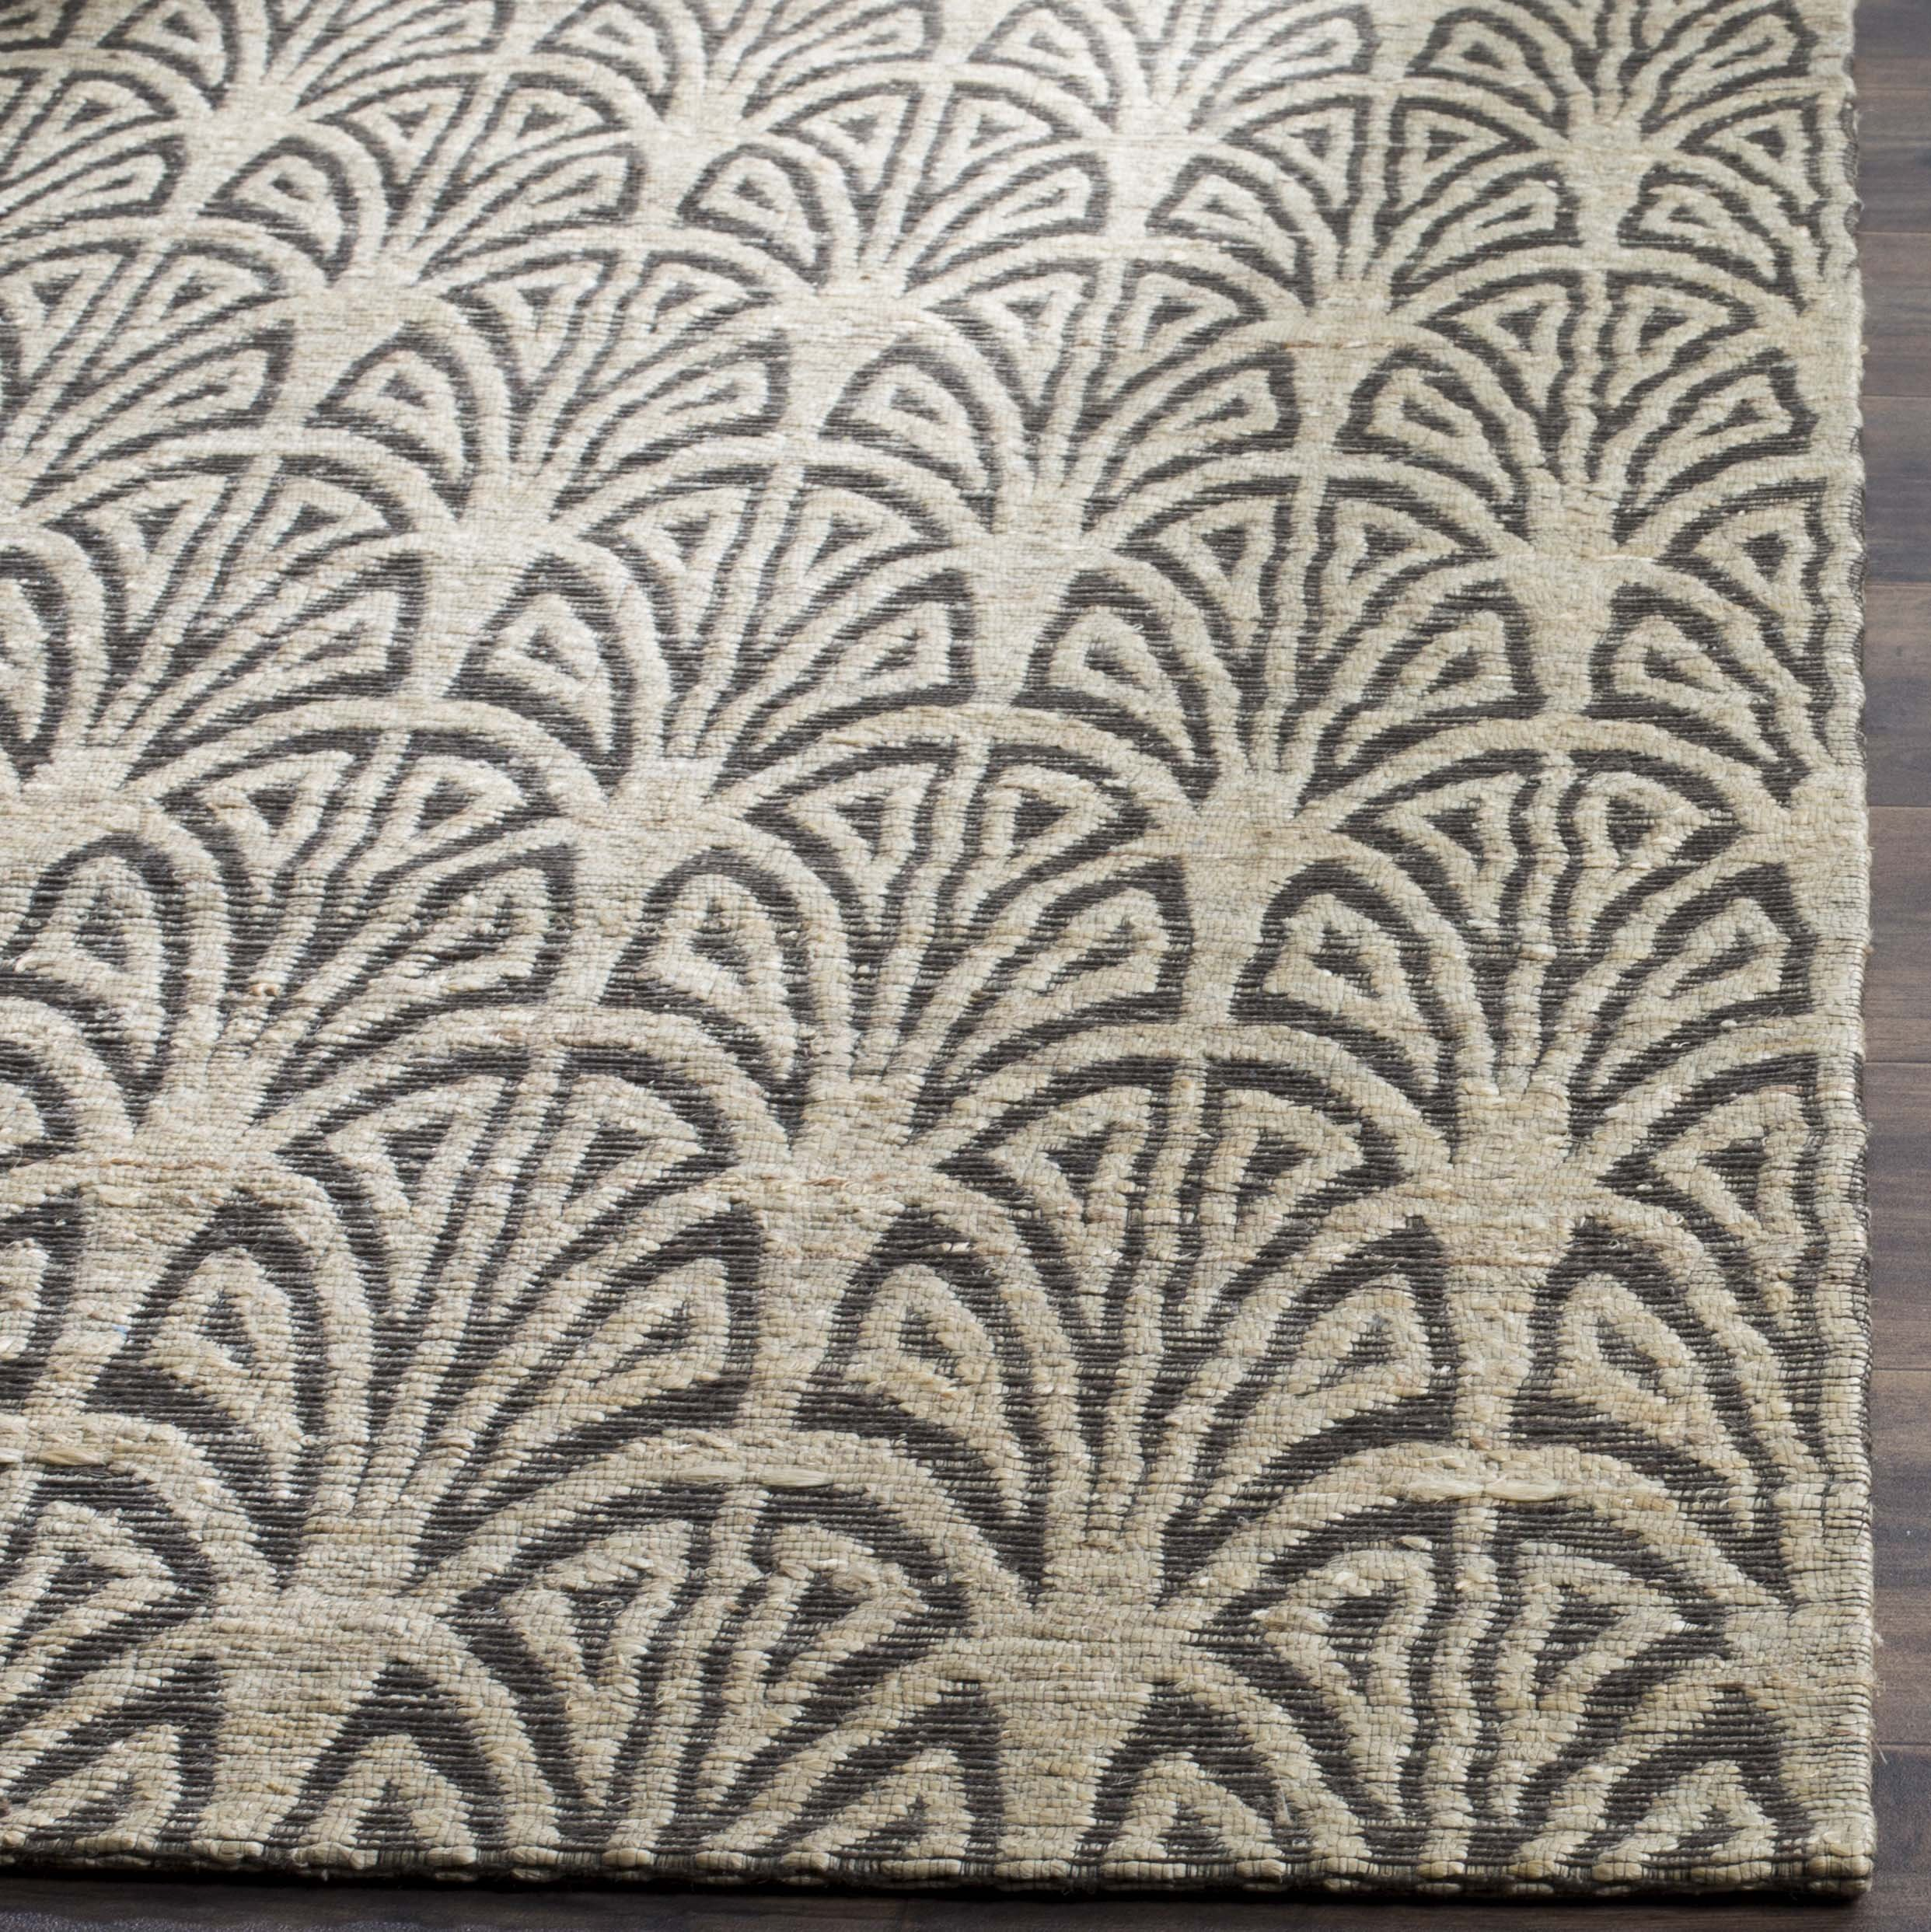 Safavieh CAP501B-5 Cape Cod Collection Flat Weave Handmade Area Rug, 5' x 8', Light Beige/Grey by Safavieh (Image #2)